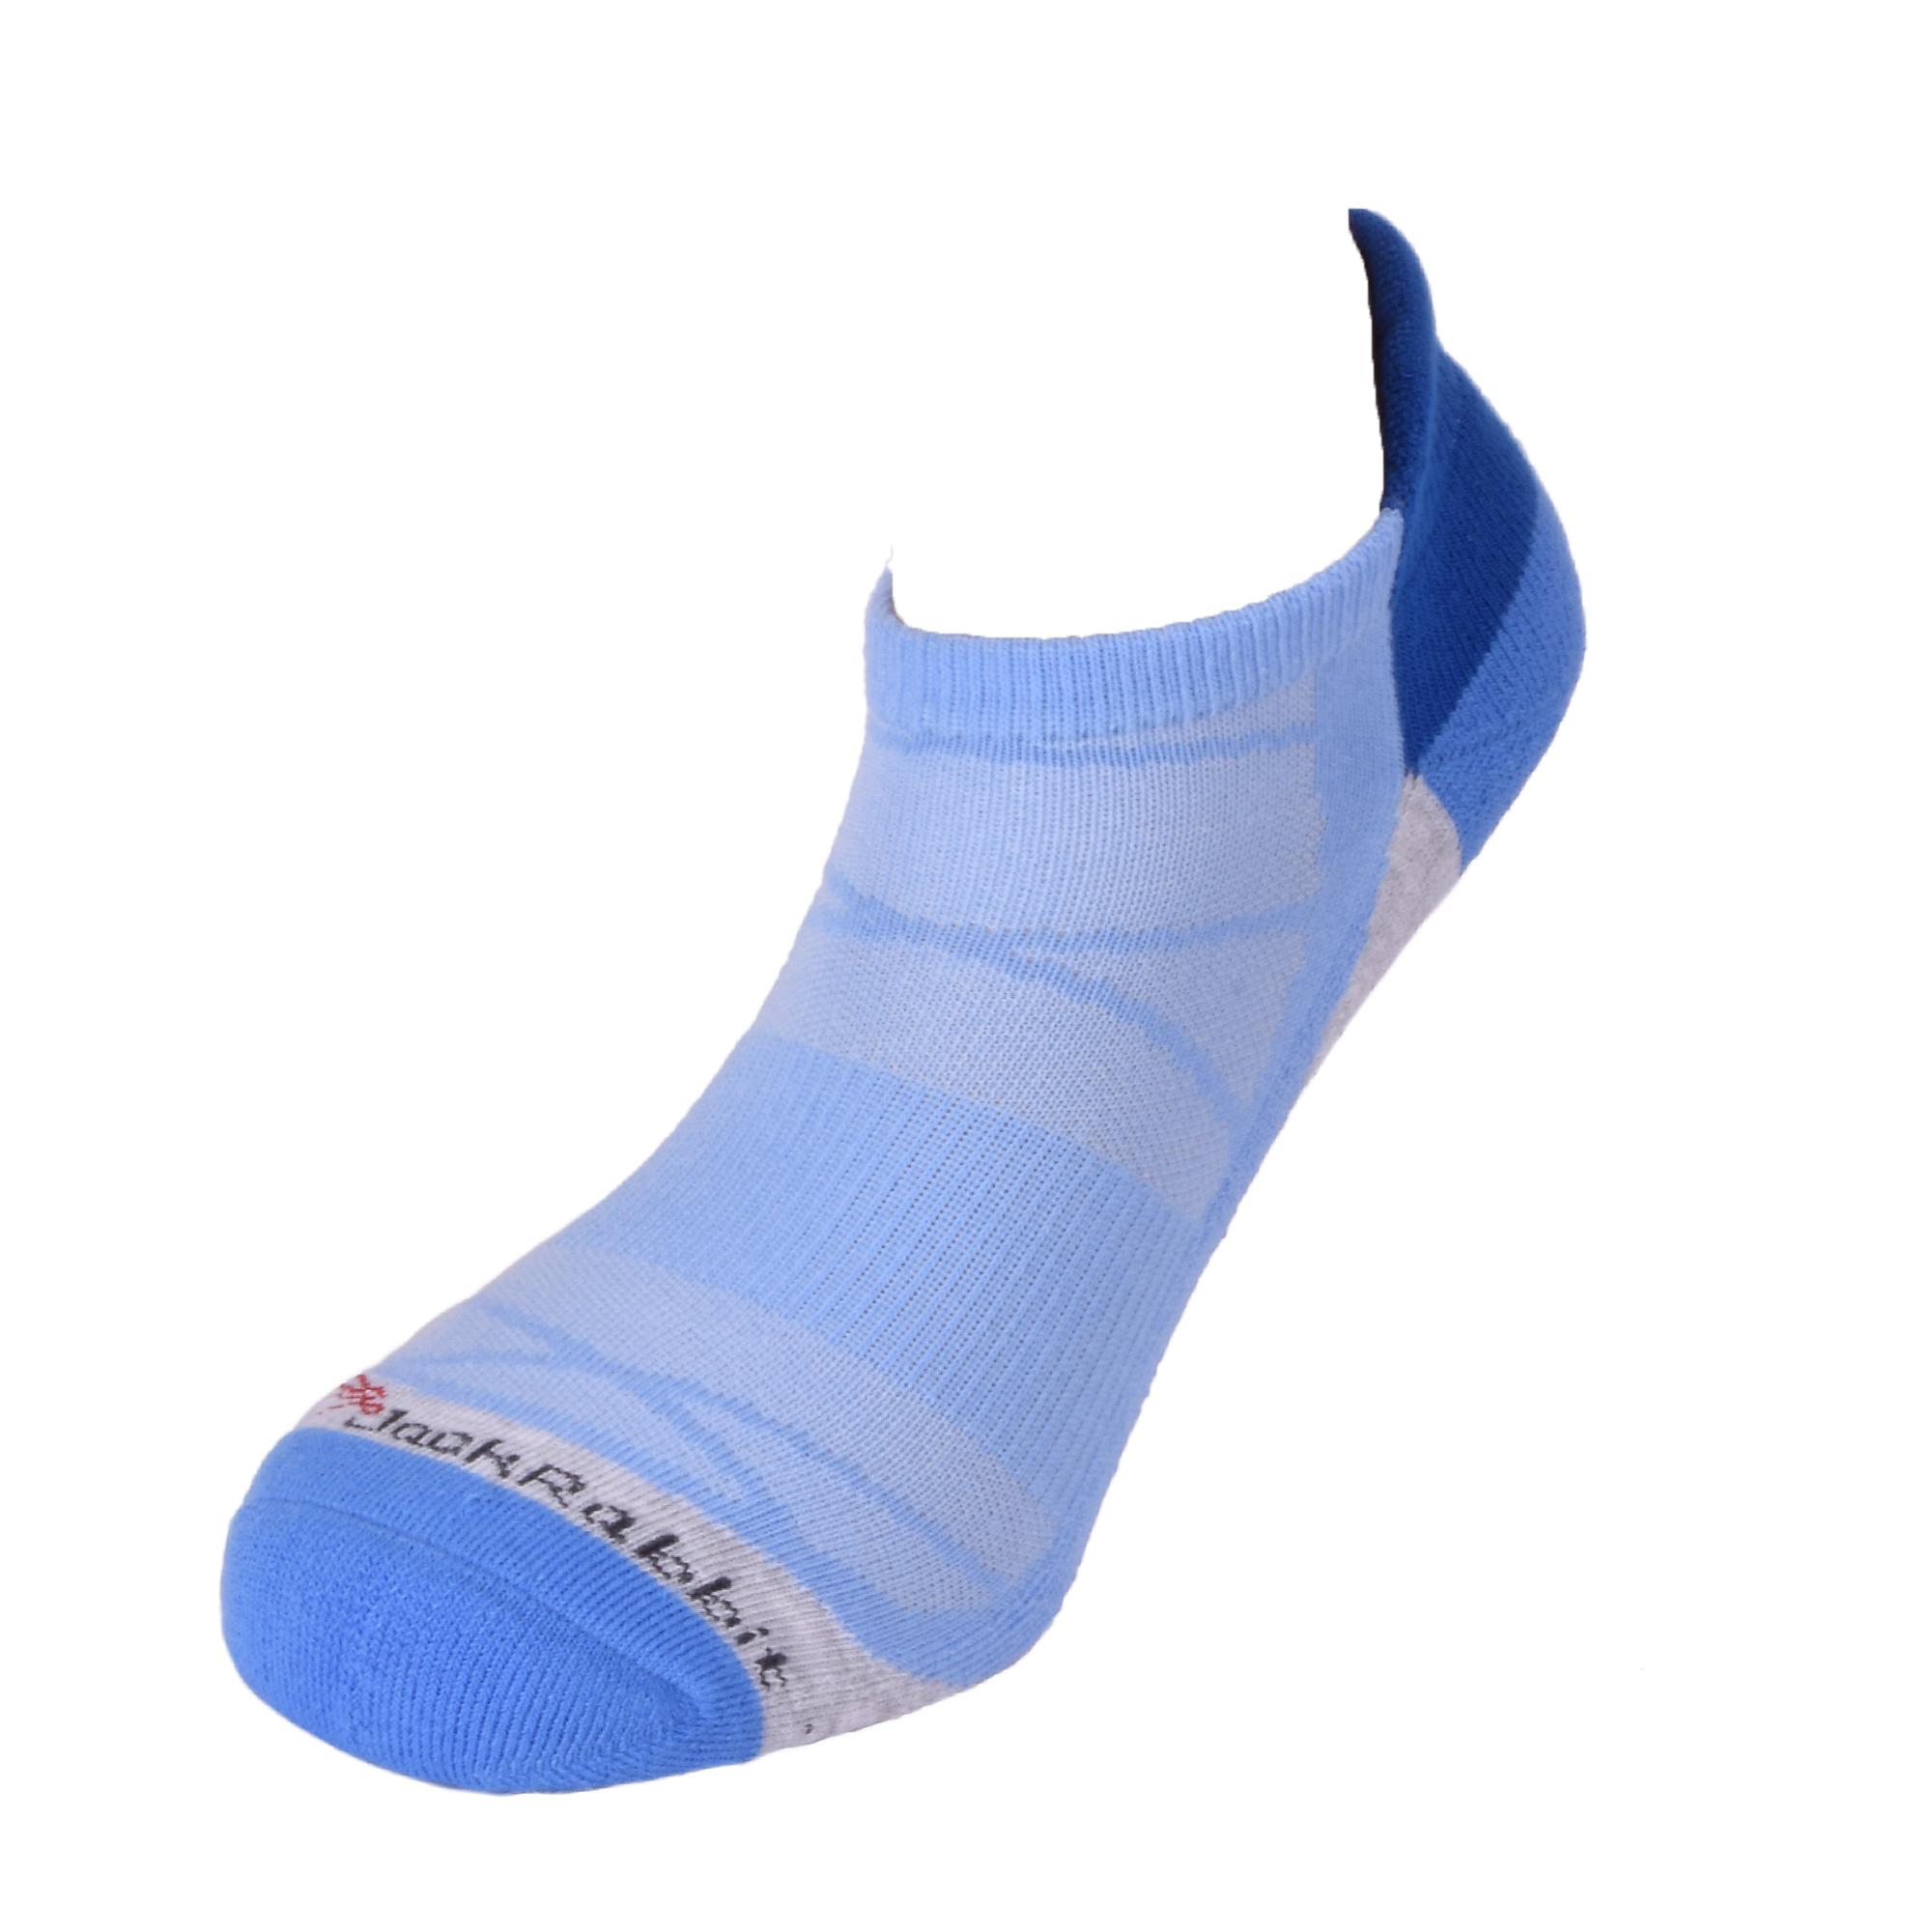 JackRabbit No Show Tab Cushion Performance Running Sock - Color: Blue - Size: S, Blue, large, image 2